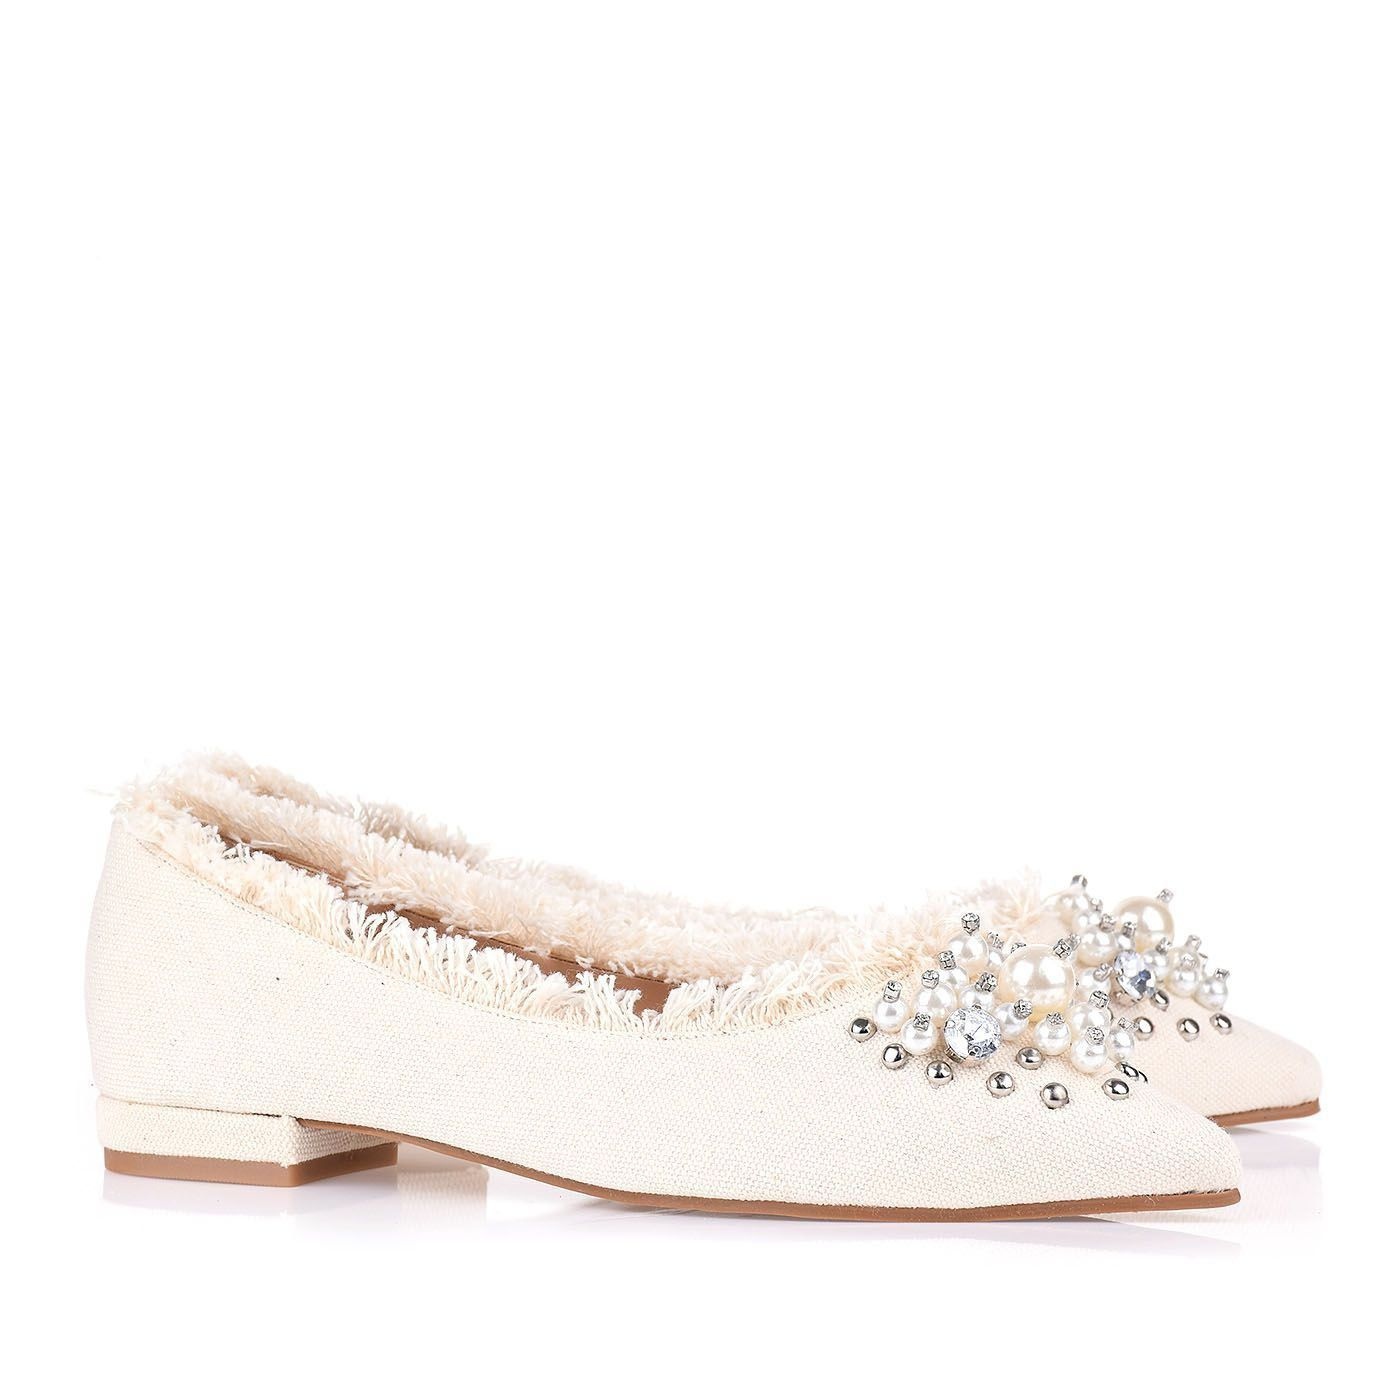 Flat Shred Pearls